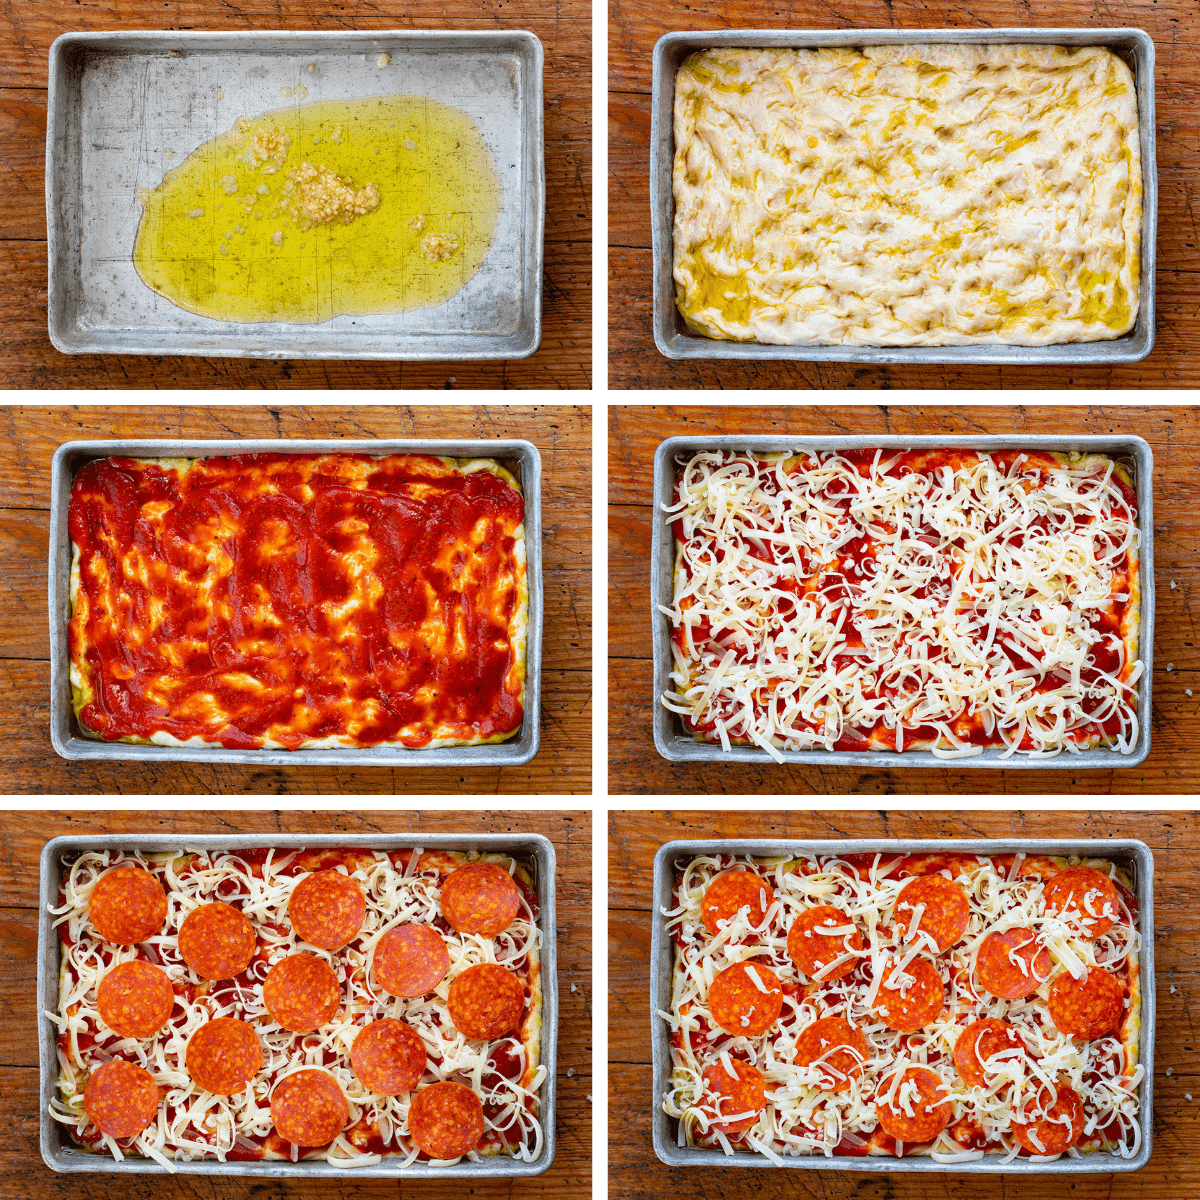 Adding the Layers to Focaccia Pepperoni Pizza